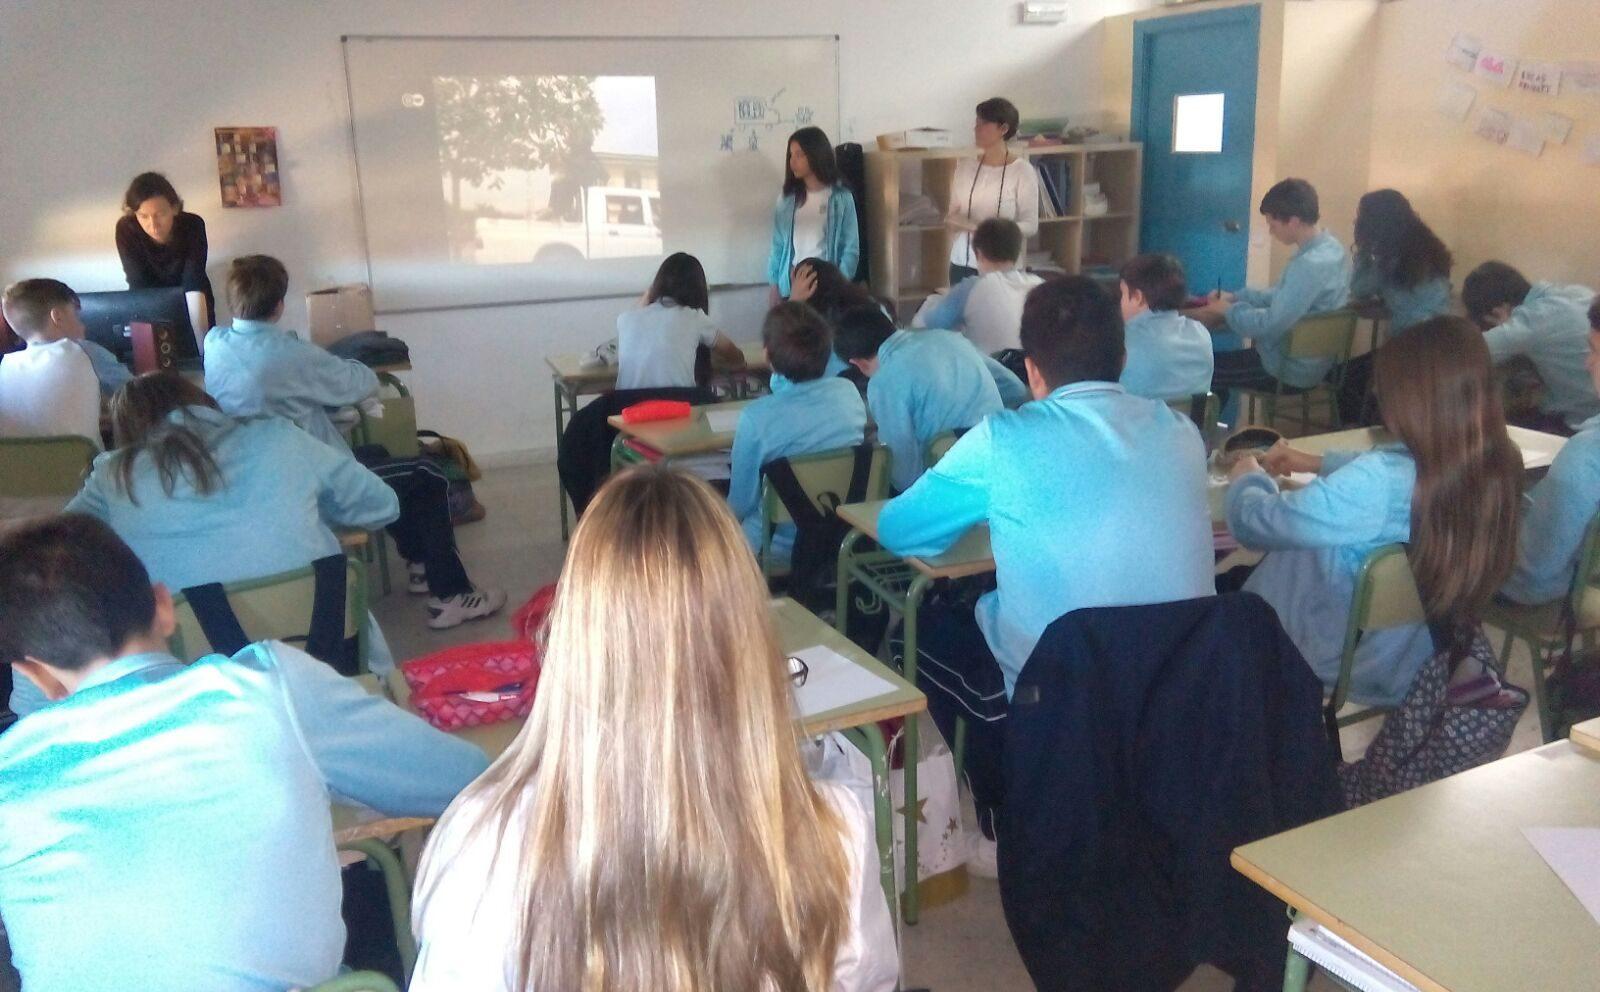 Recursos para hacer mindfulness con alumnos escépticos